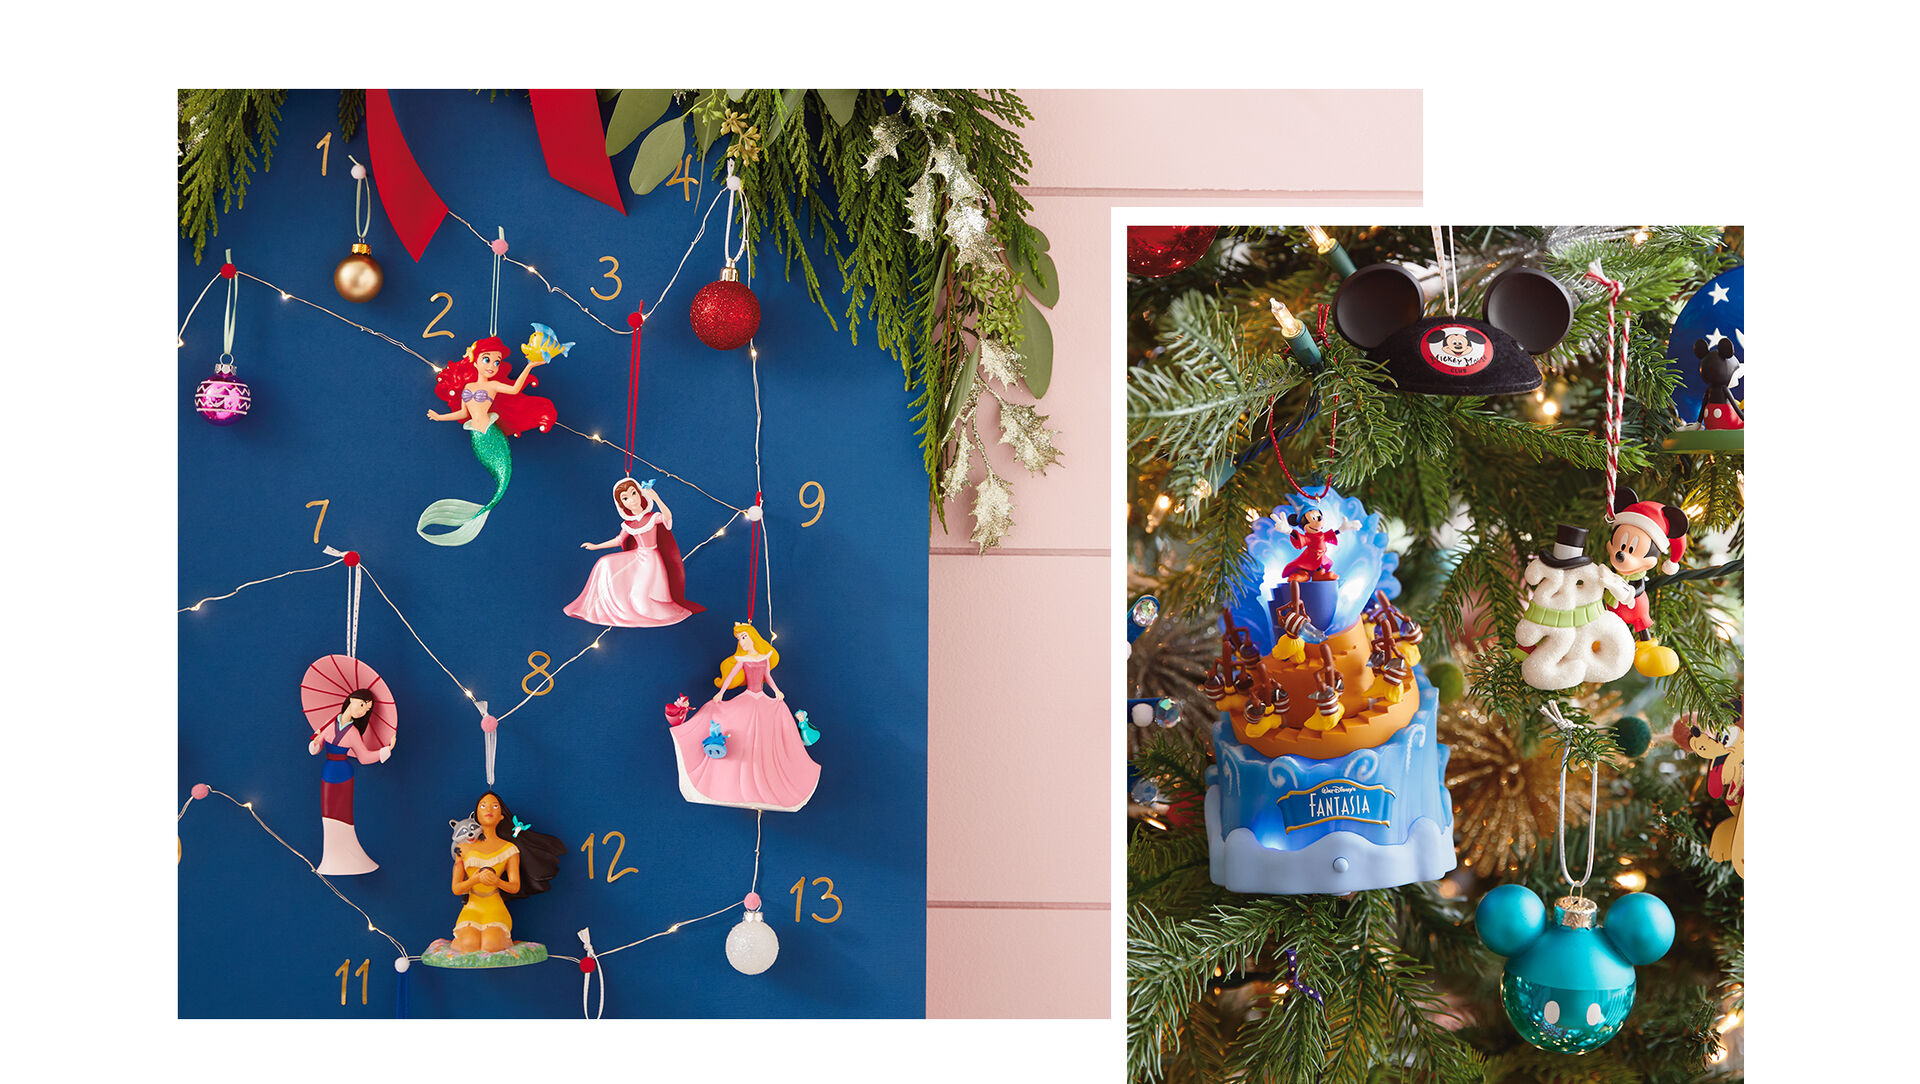 Christmas Ornaments 2020 New Series Hallmark Dream Book 2020 | Browse Keepsake Ornaments Online | Hallmark